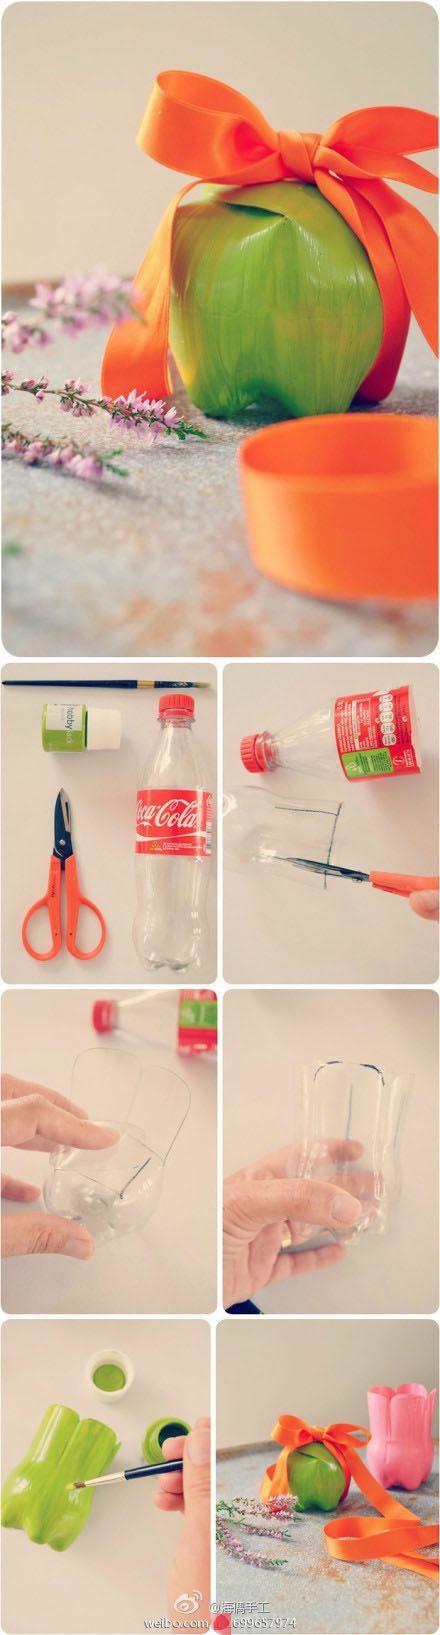 Pinterest the world s catalog of ideas for Plastic bottle project ideas